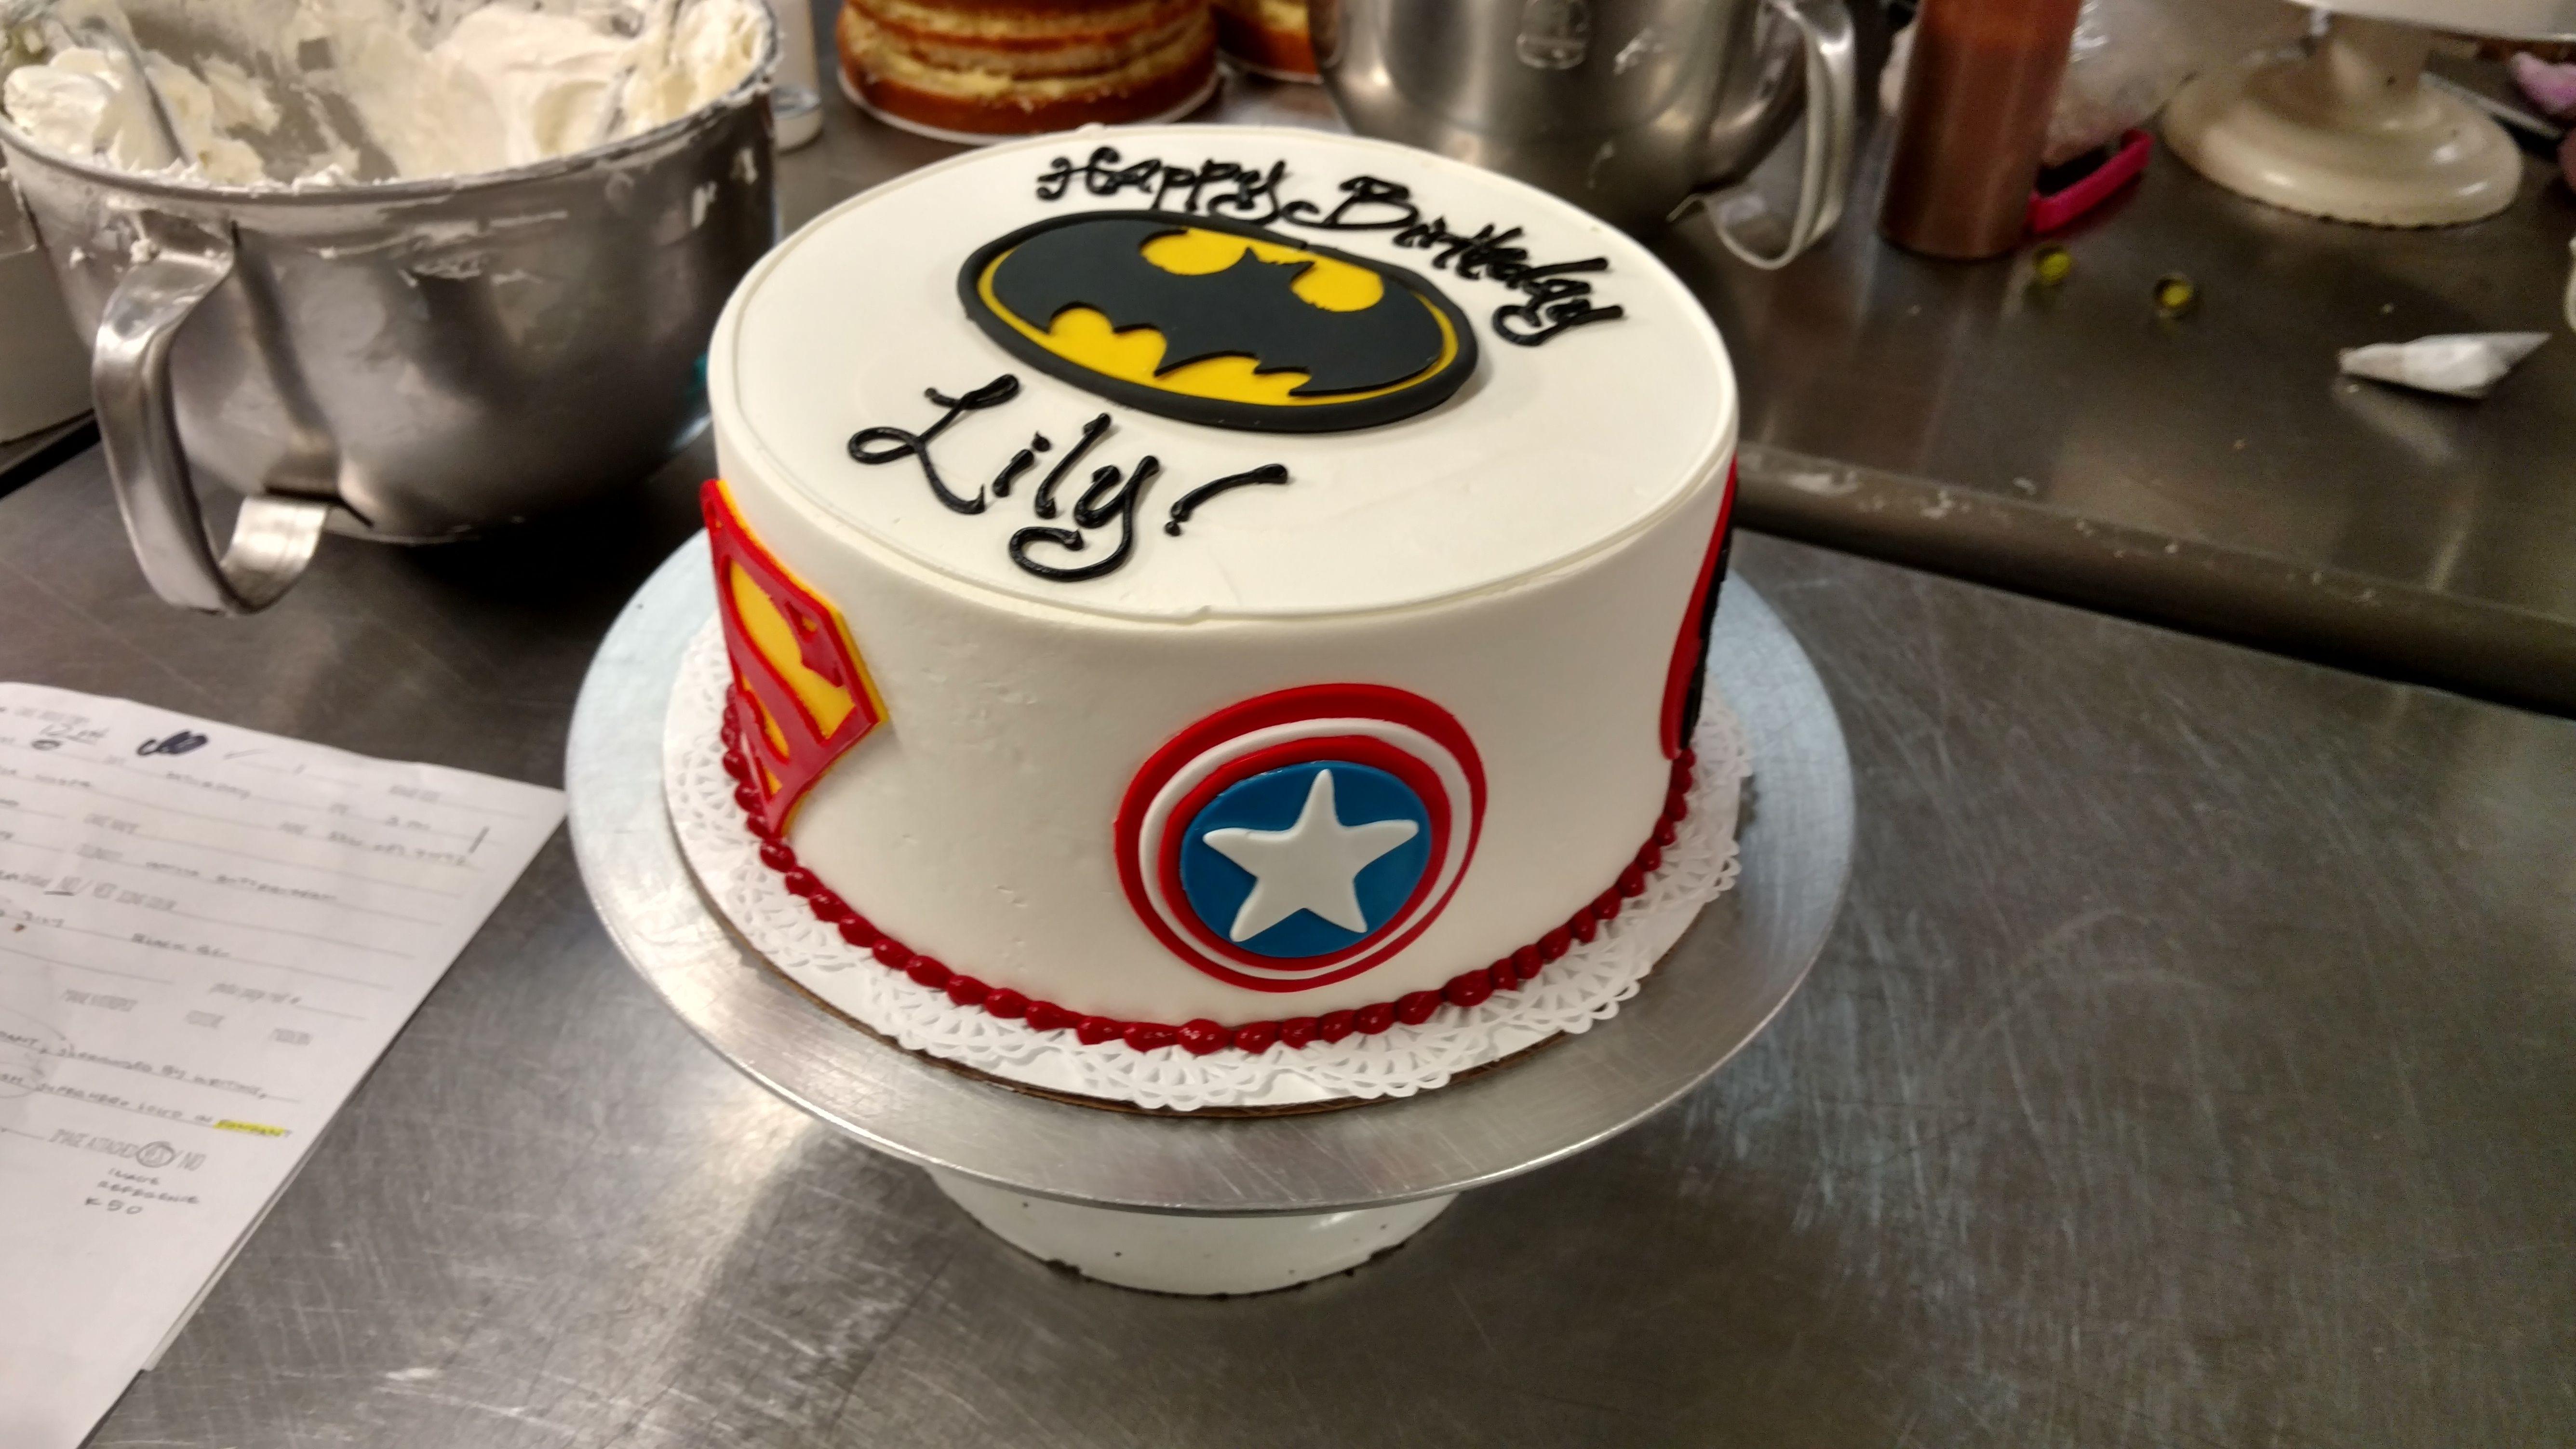 A Superhero Themed Birthday Cake With Fondant Dc And Marvel Logos